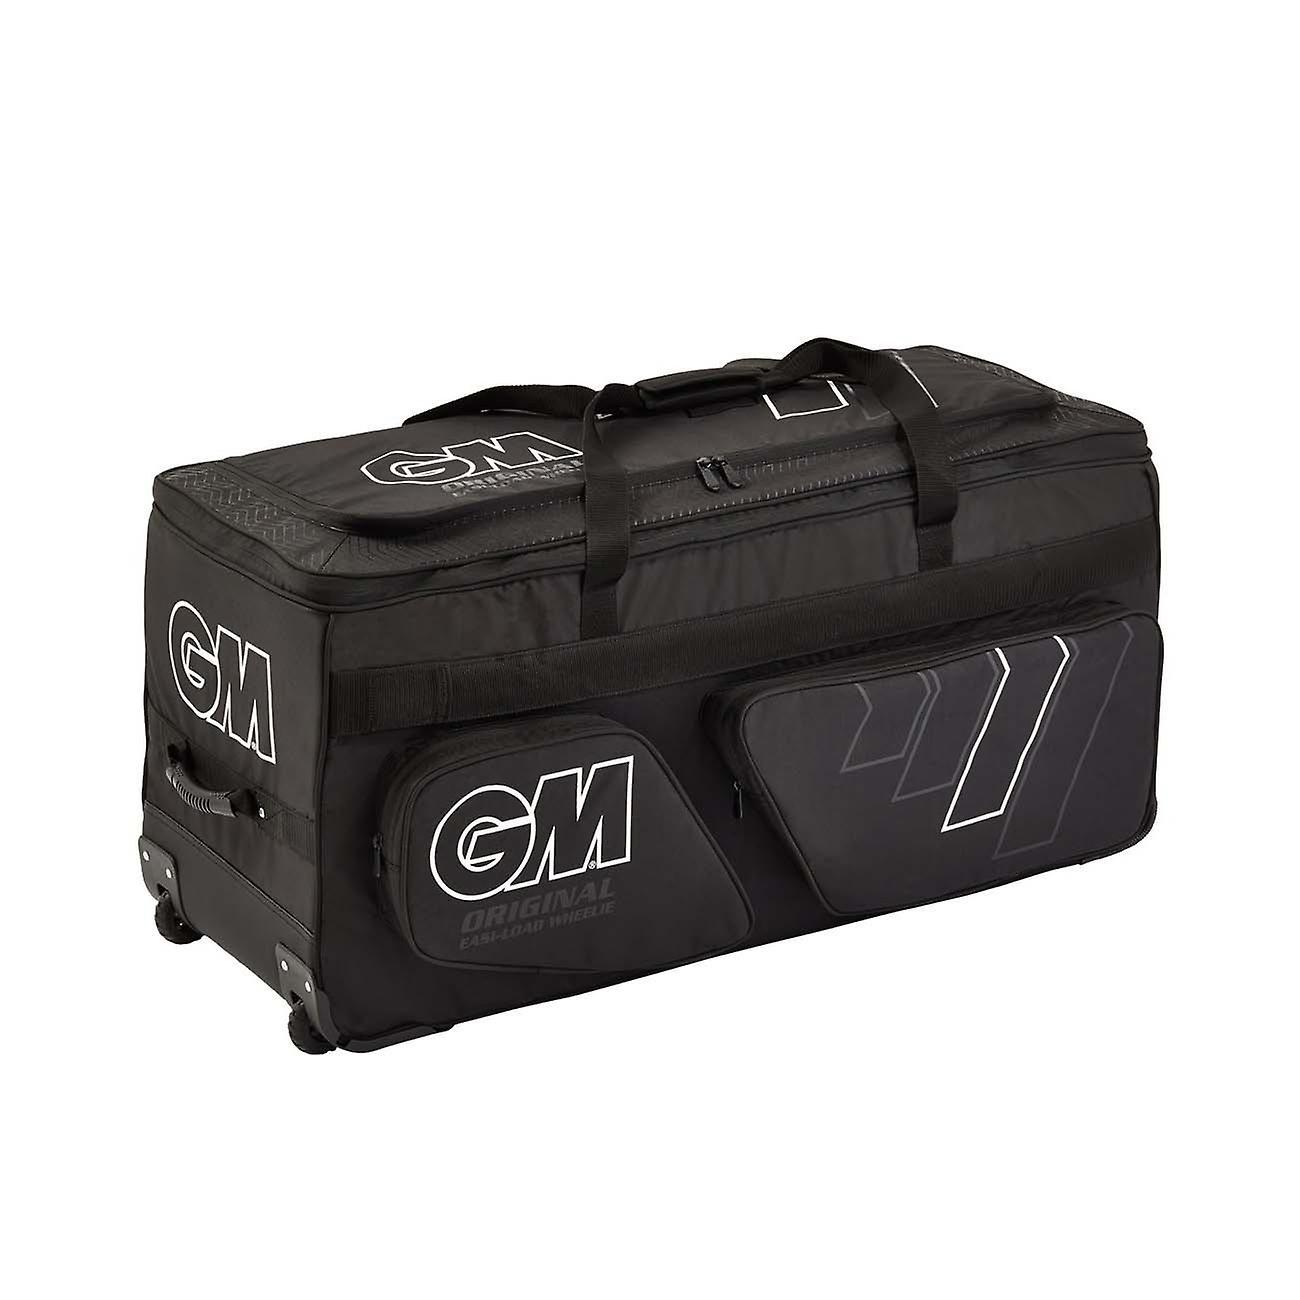 Gunn & Moore 2020 Original Easi-Load Wheelie Cricket Duffle Holdall Bag Black